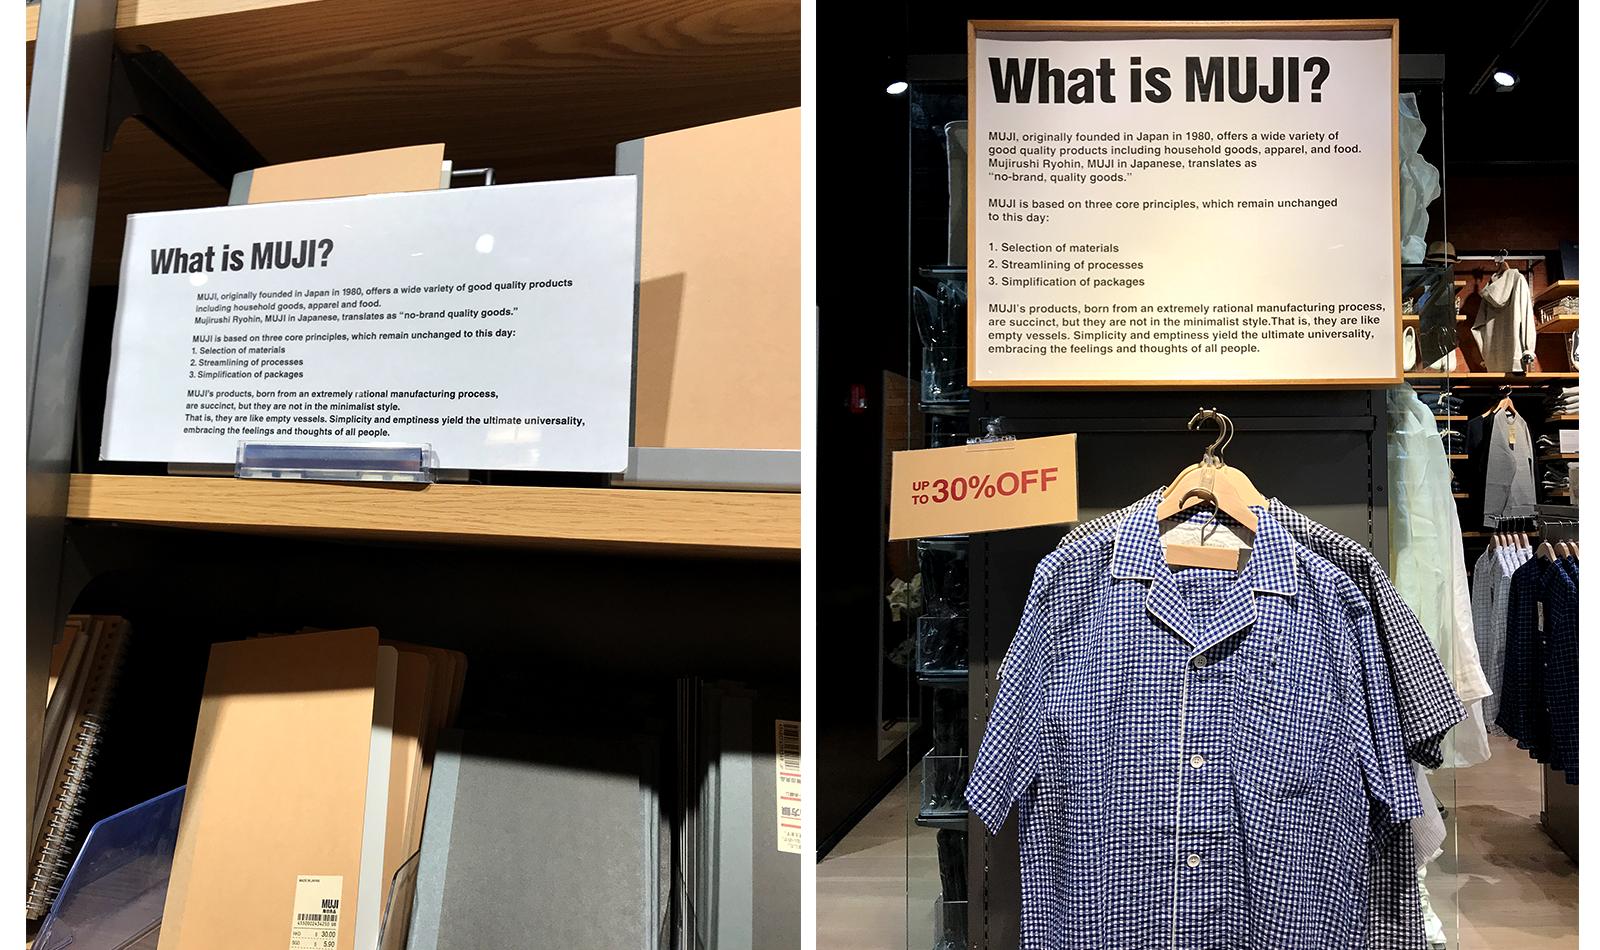 muji-signage-NYC-store